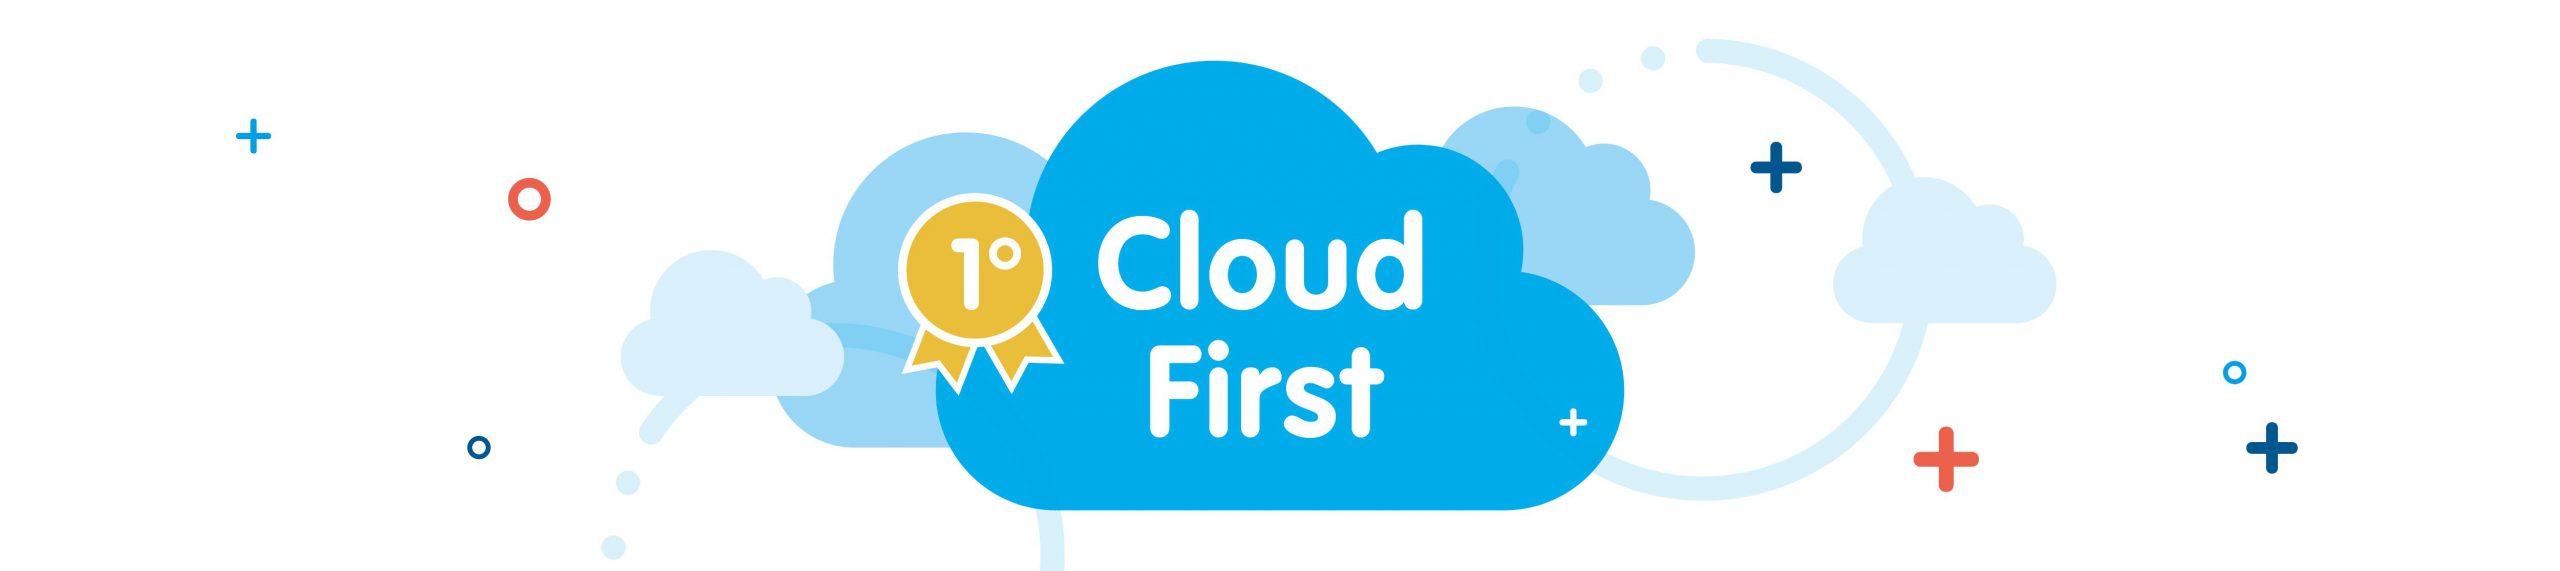 Cisco UCM Cloud First!